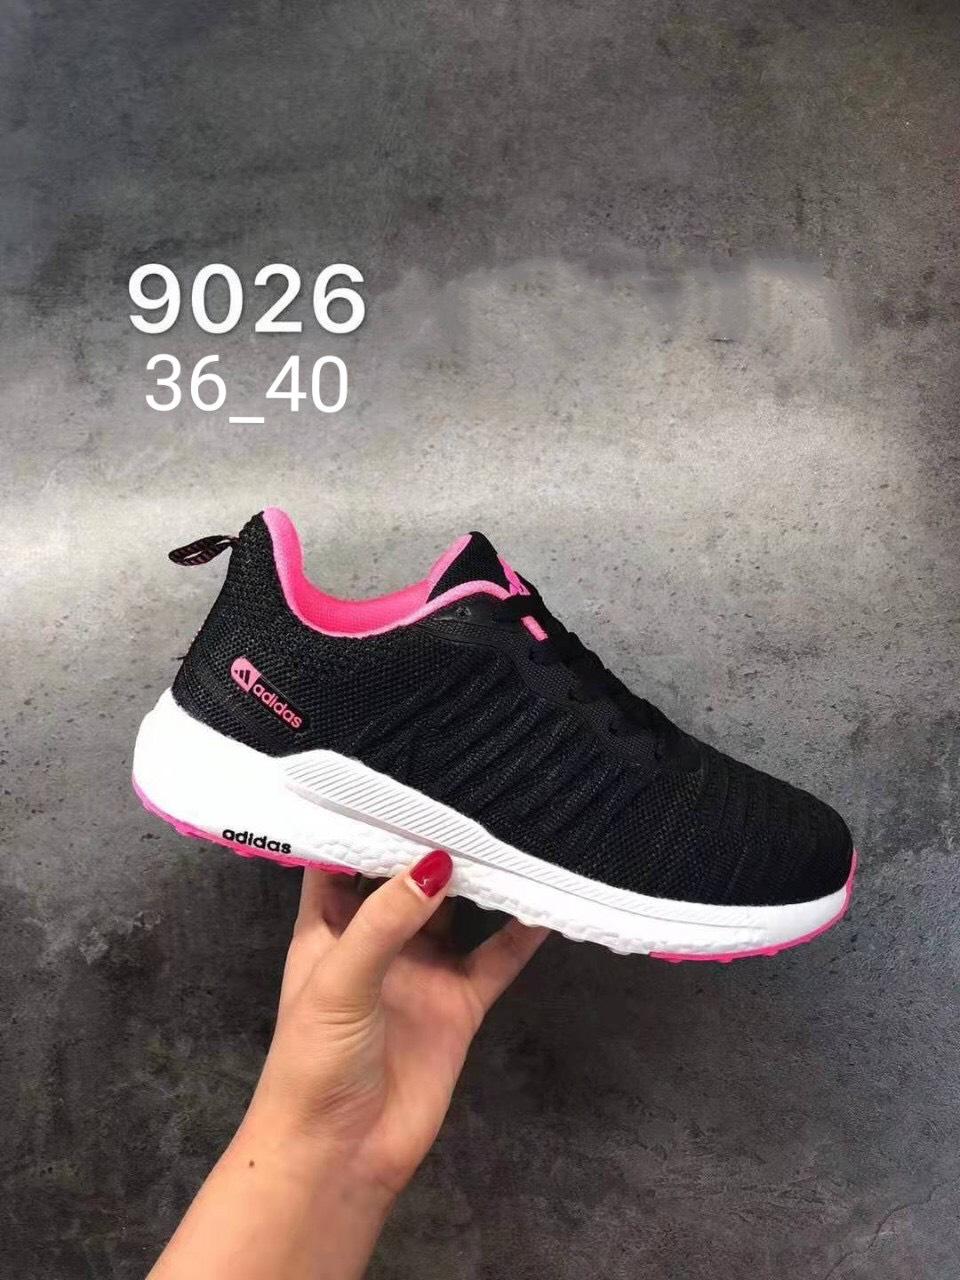 Giày Adidas Neo nữ V26 hồng